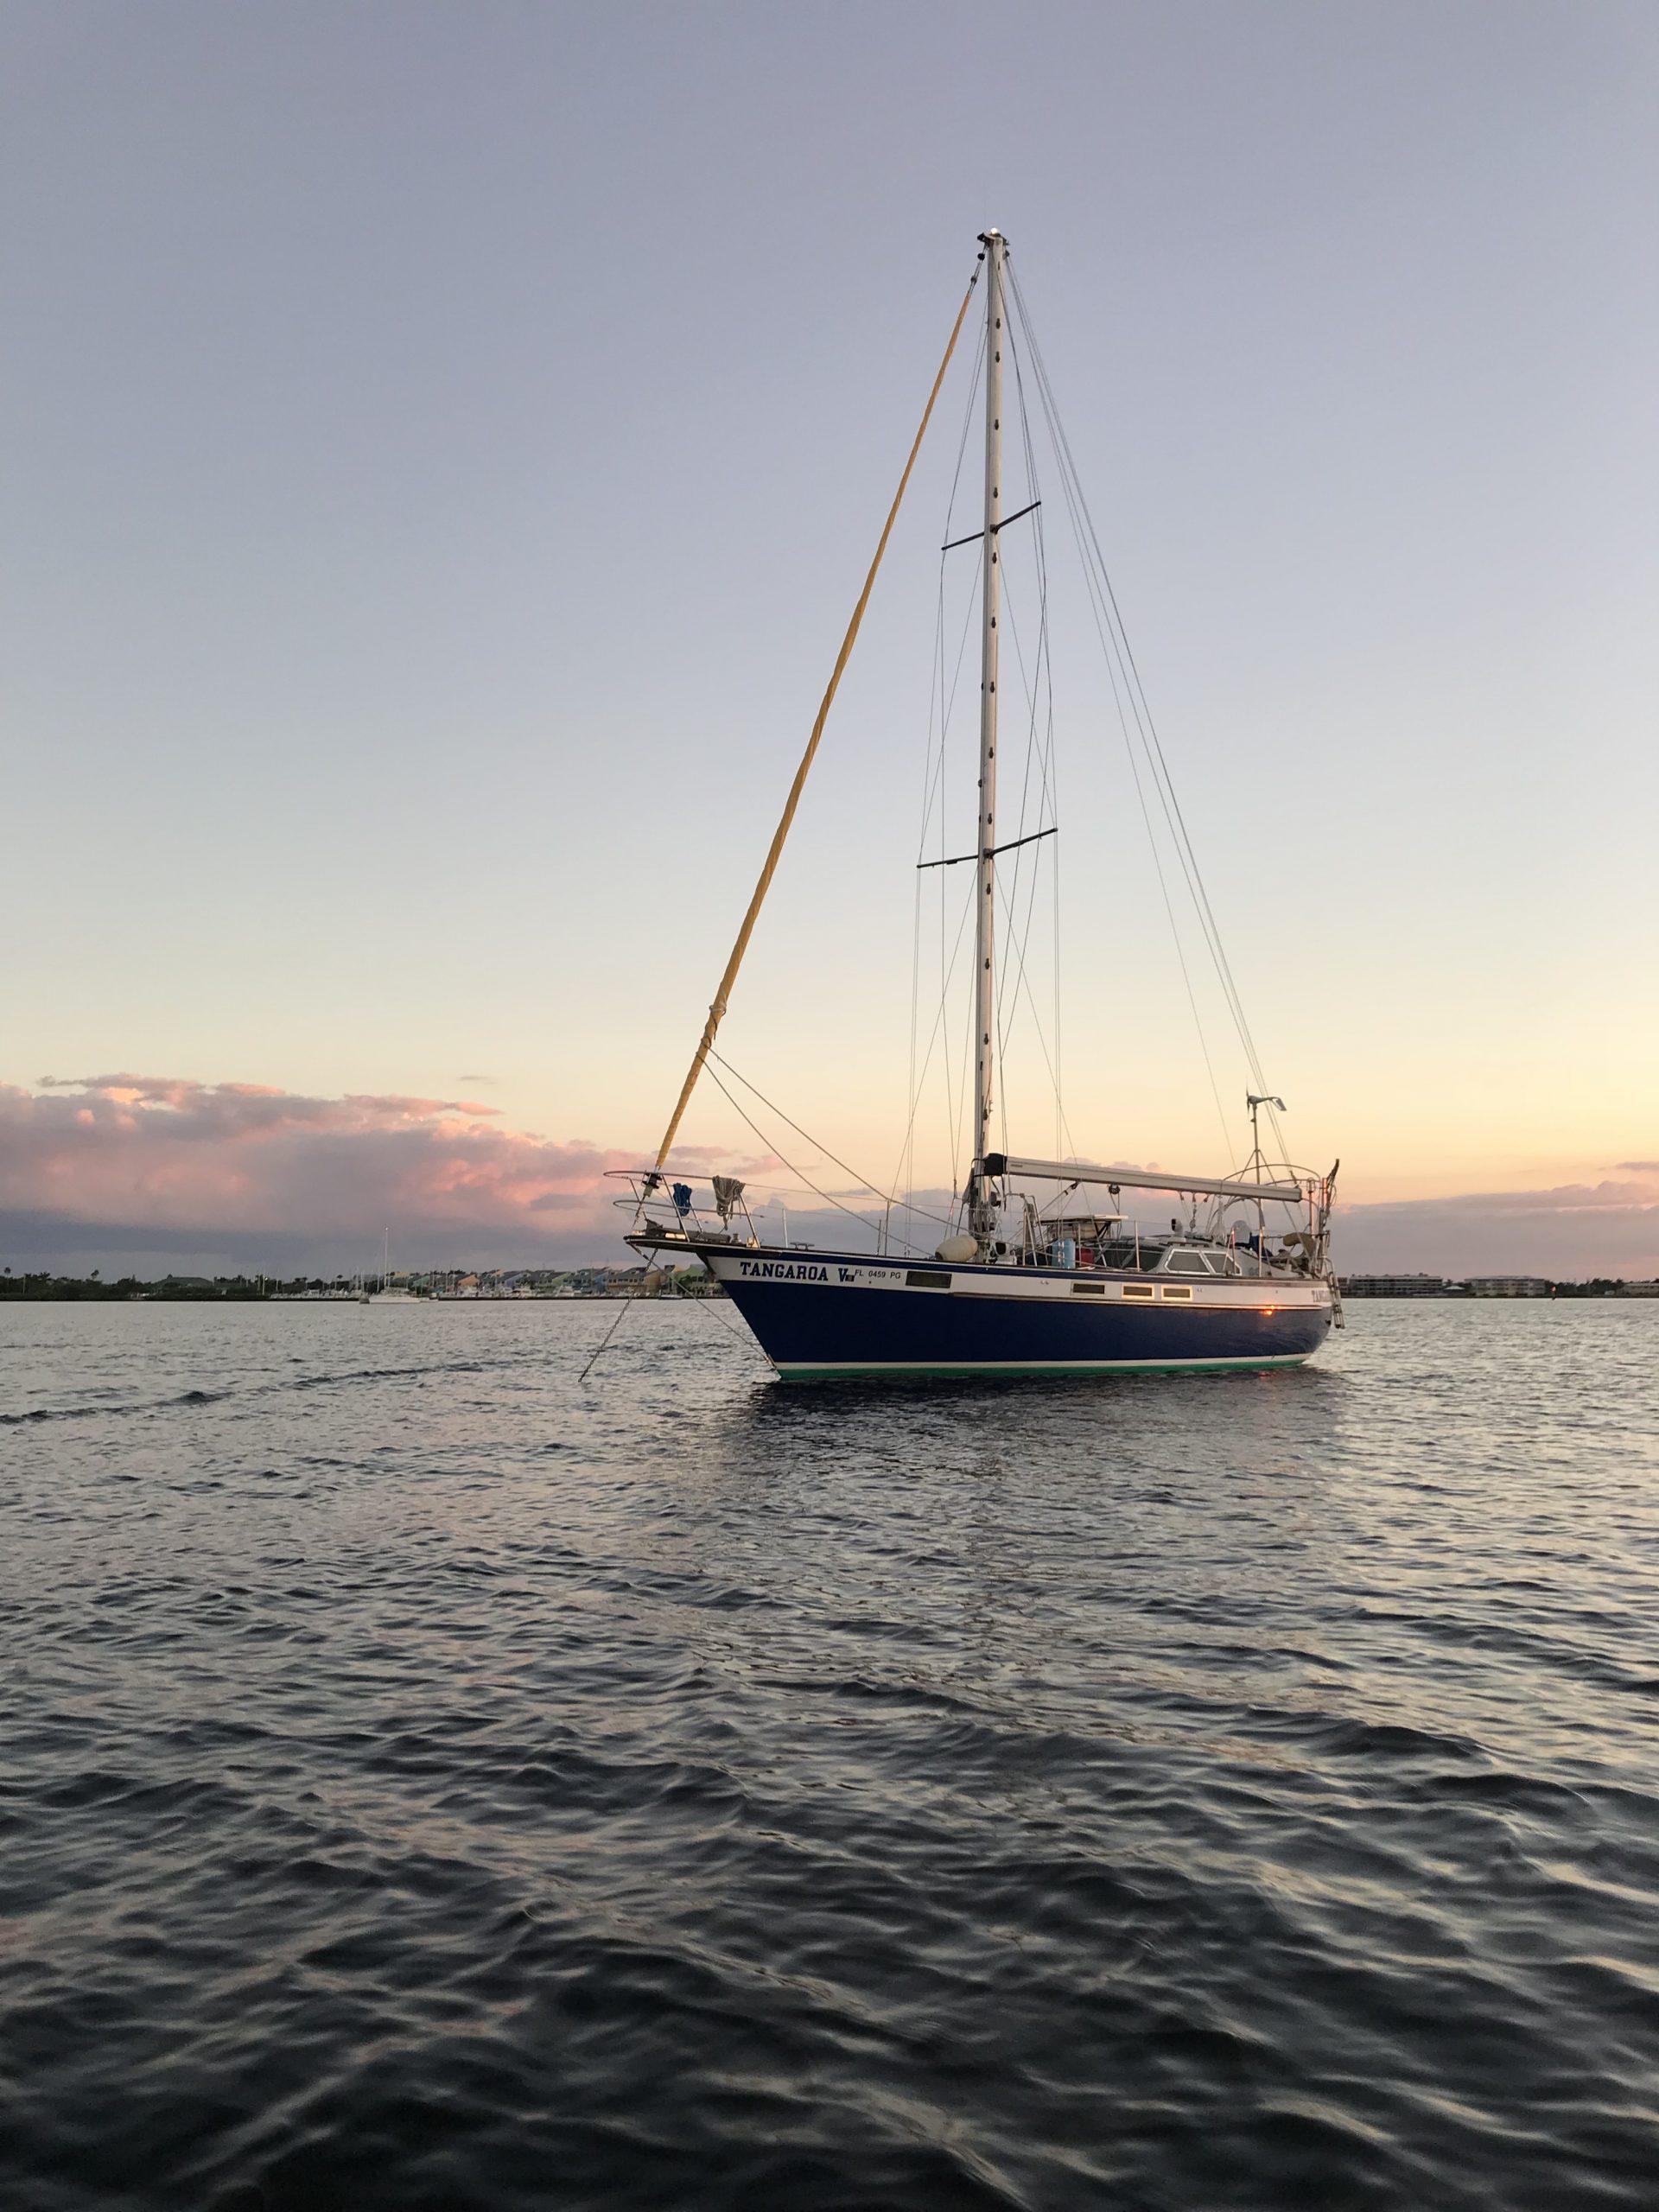 189 - Tangaroa V - anchored